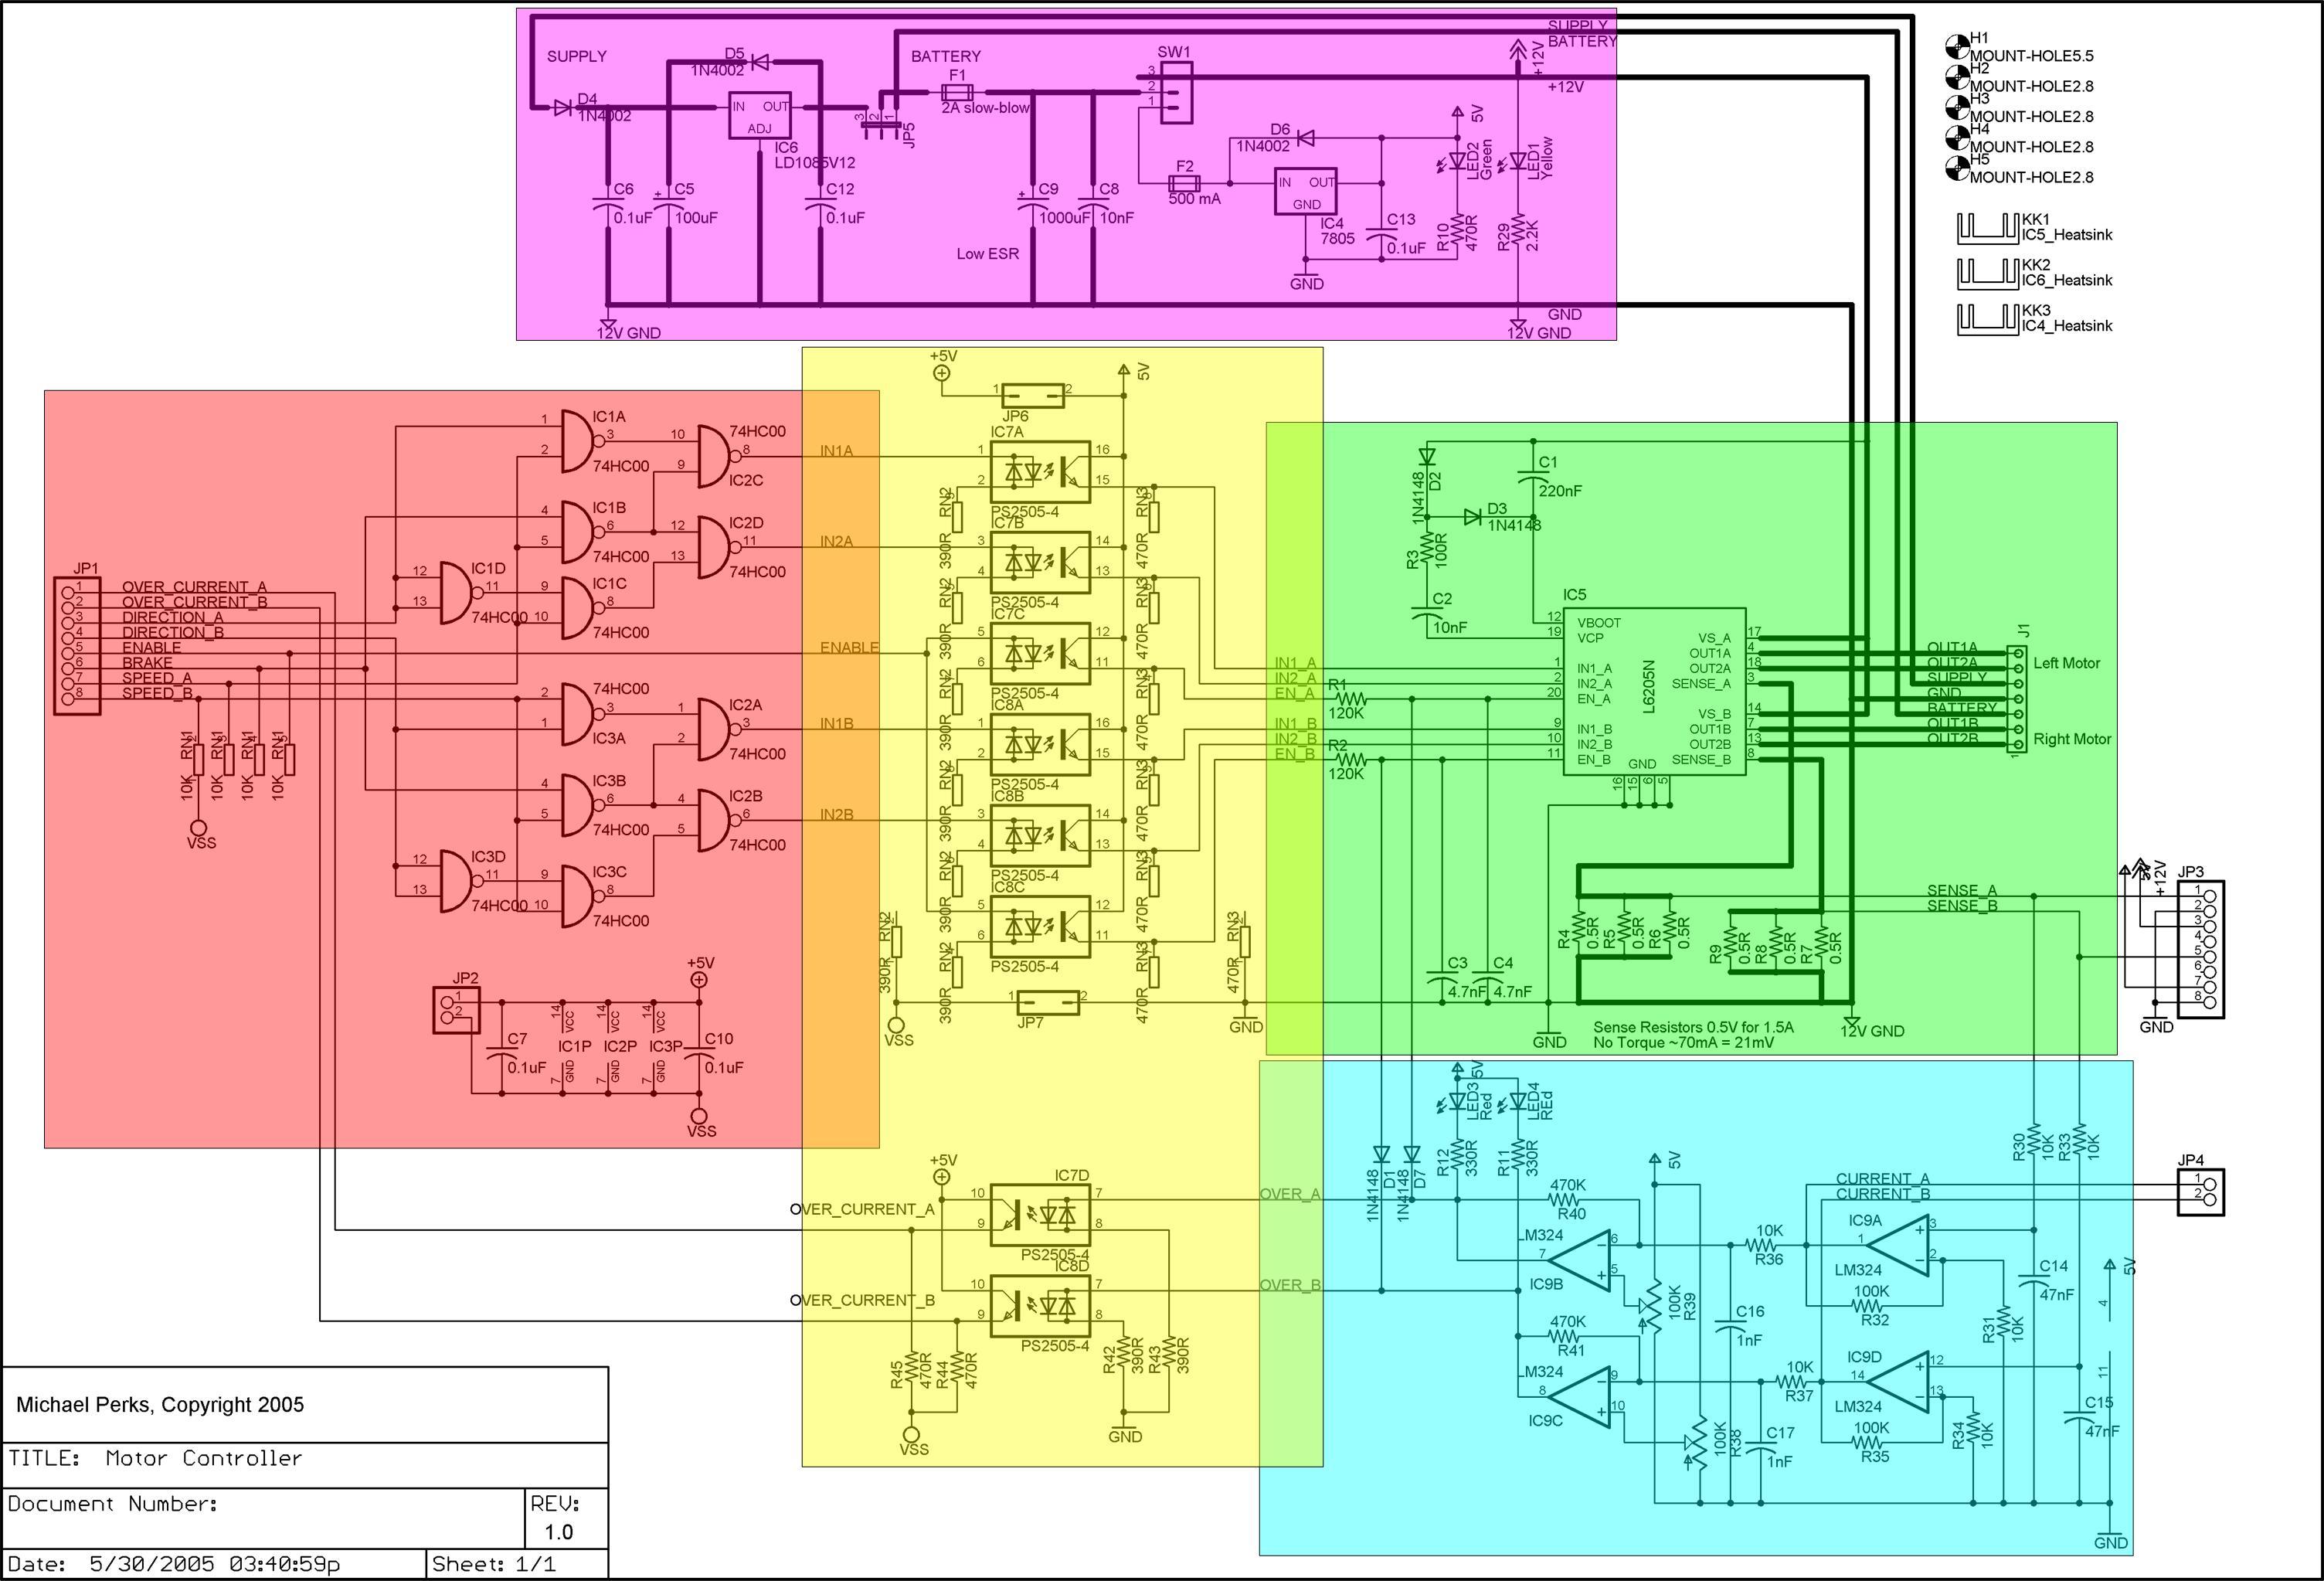 Orangerx Kk2 Wiring Diagram